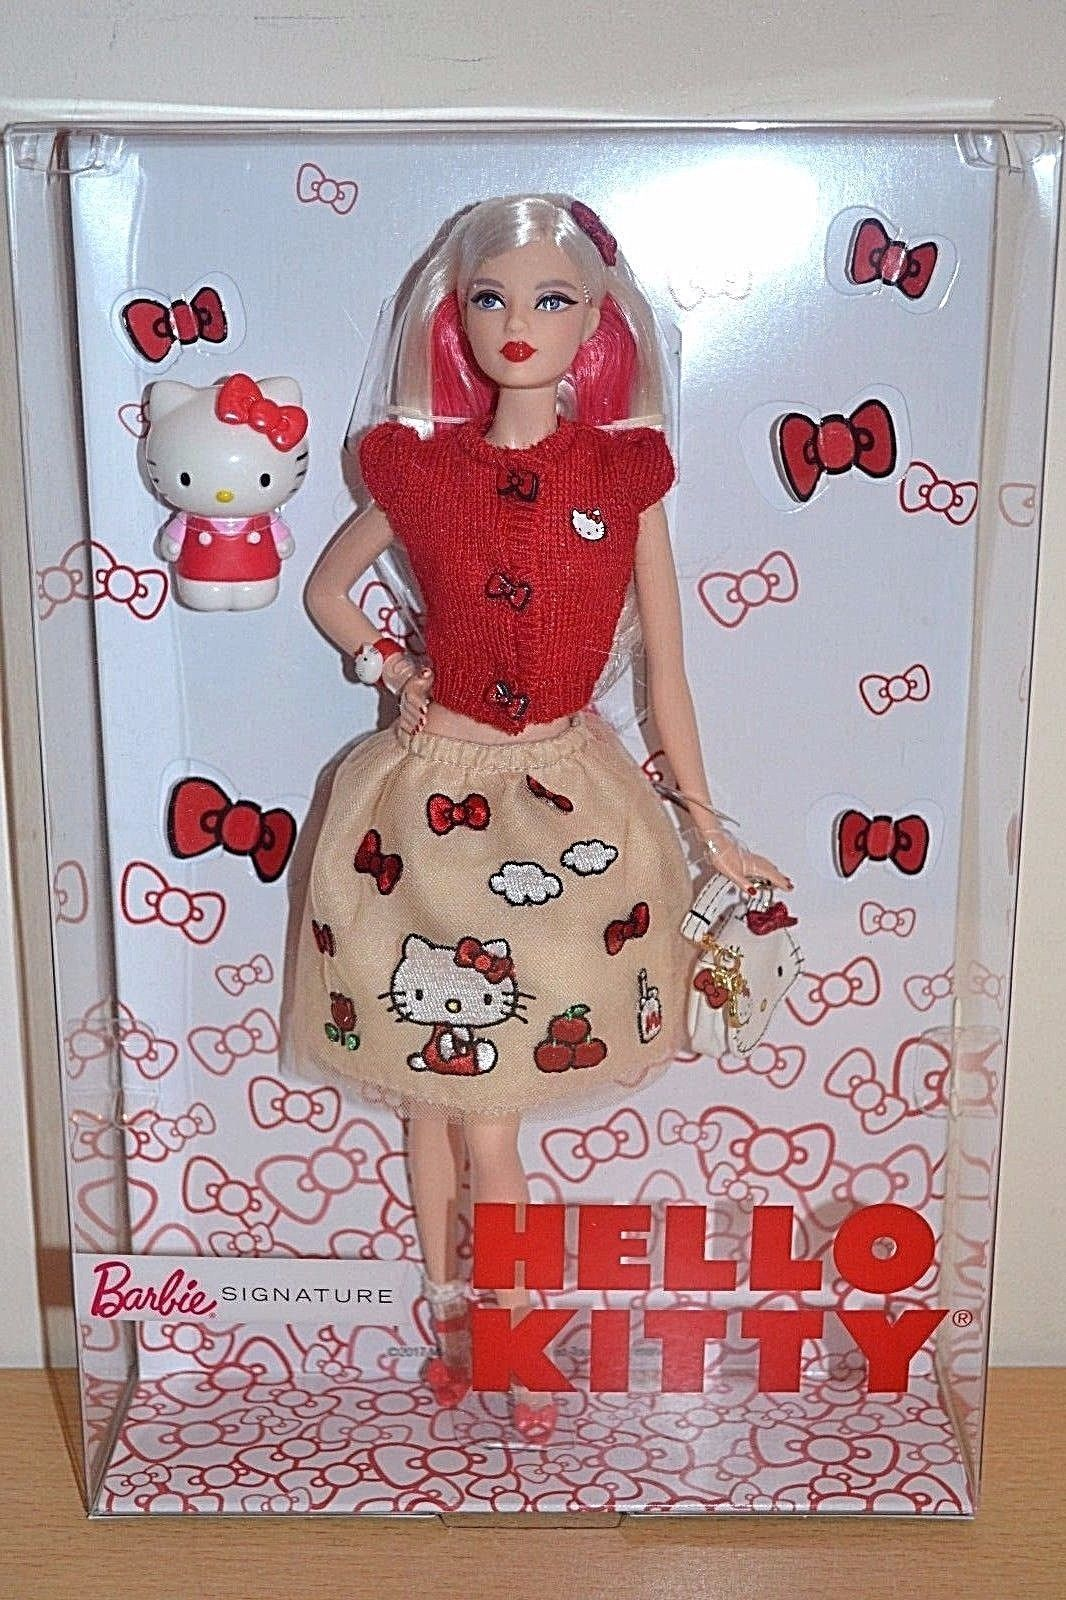 Barbie DWF58 Hello Kitty Fashion Doll Signature